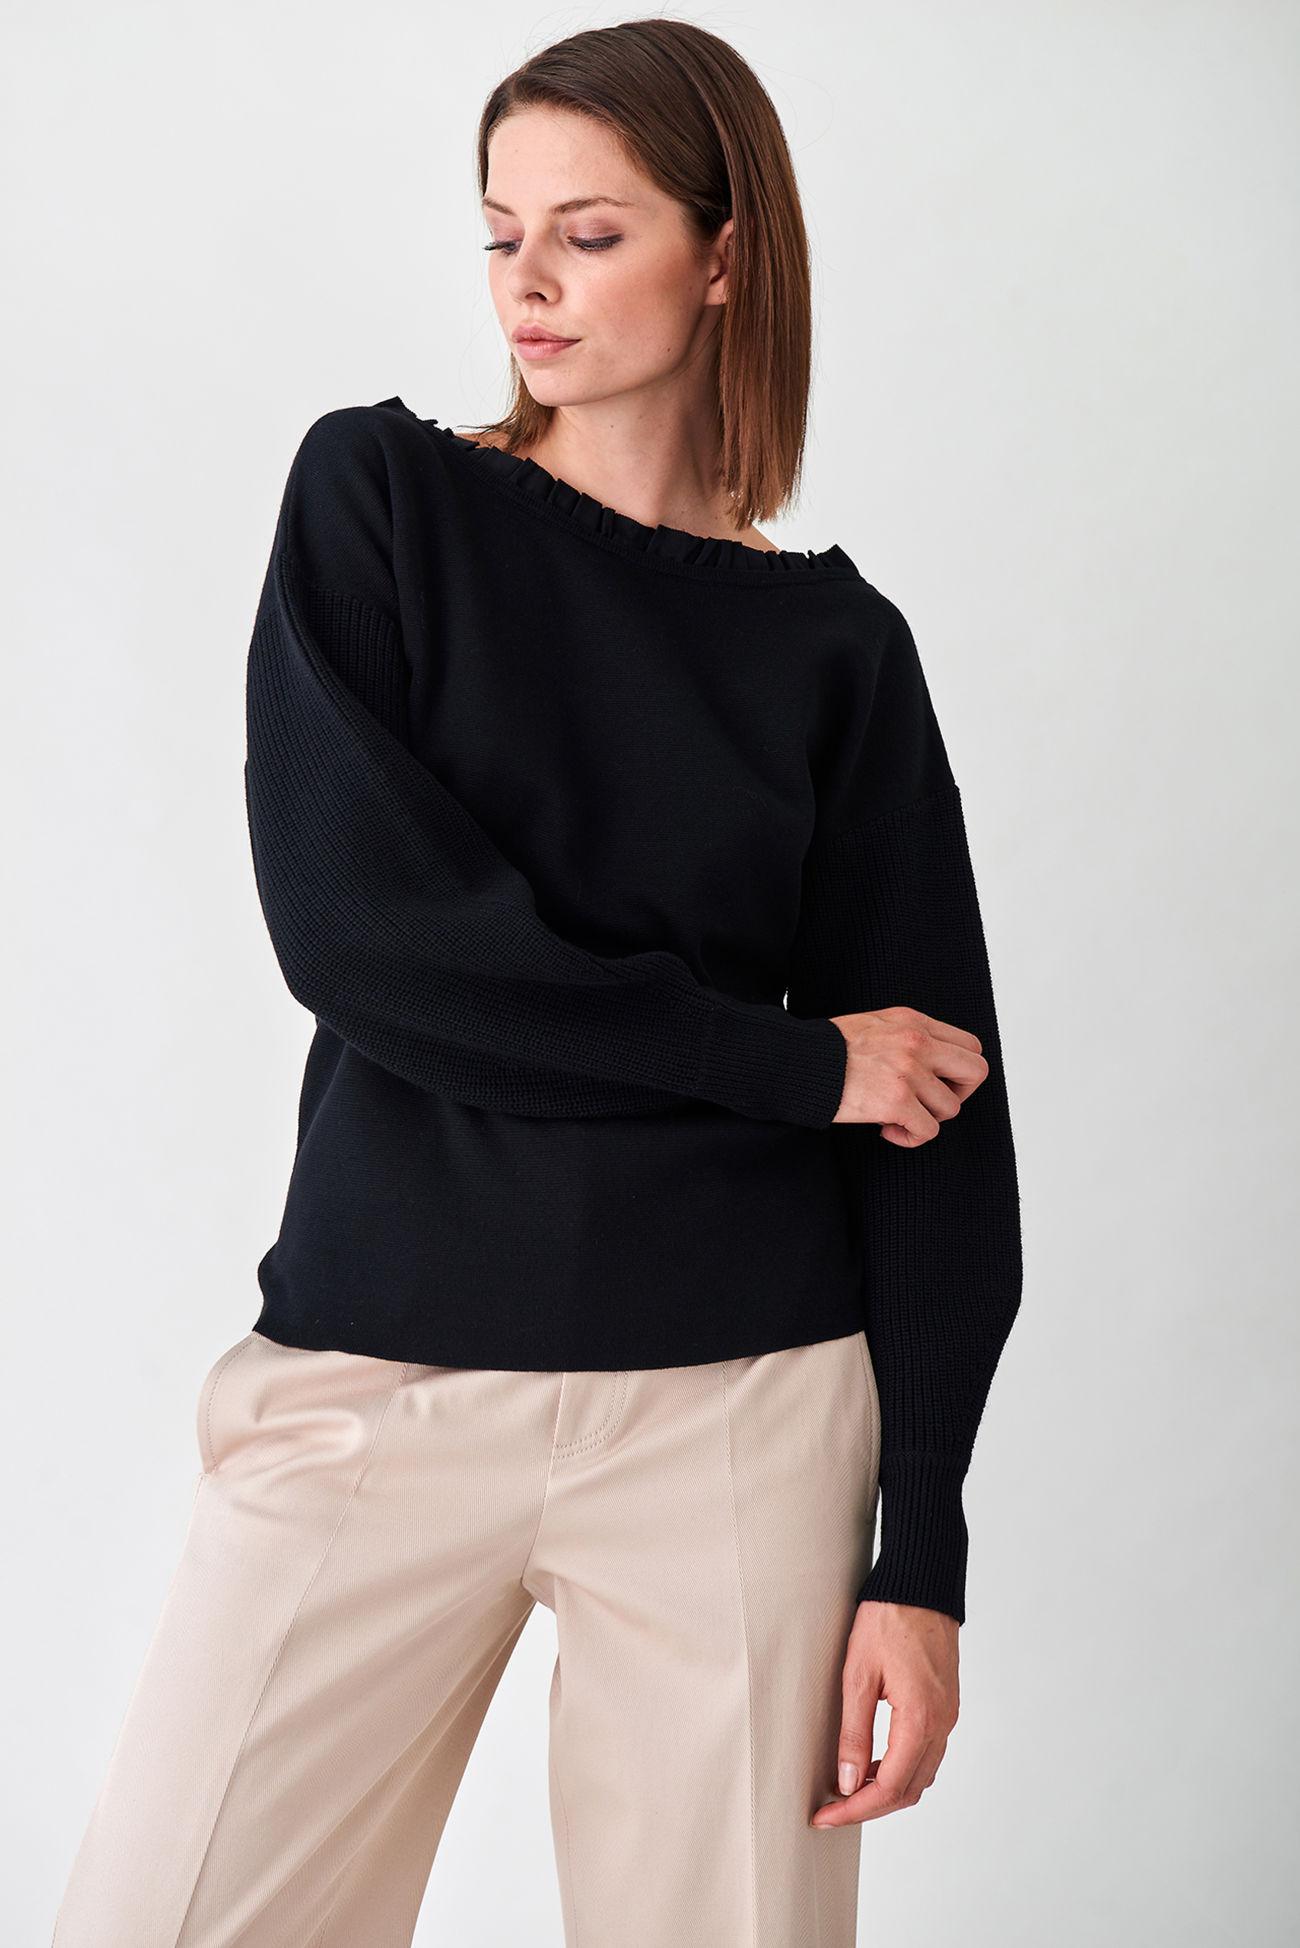 Gerippter Merino-Pullover interessanten Ausschnittdetails